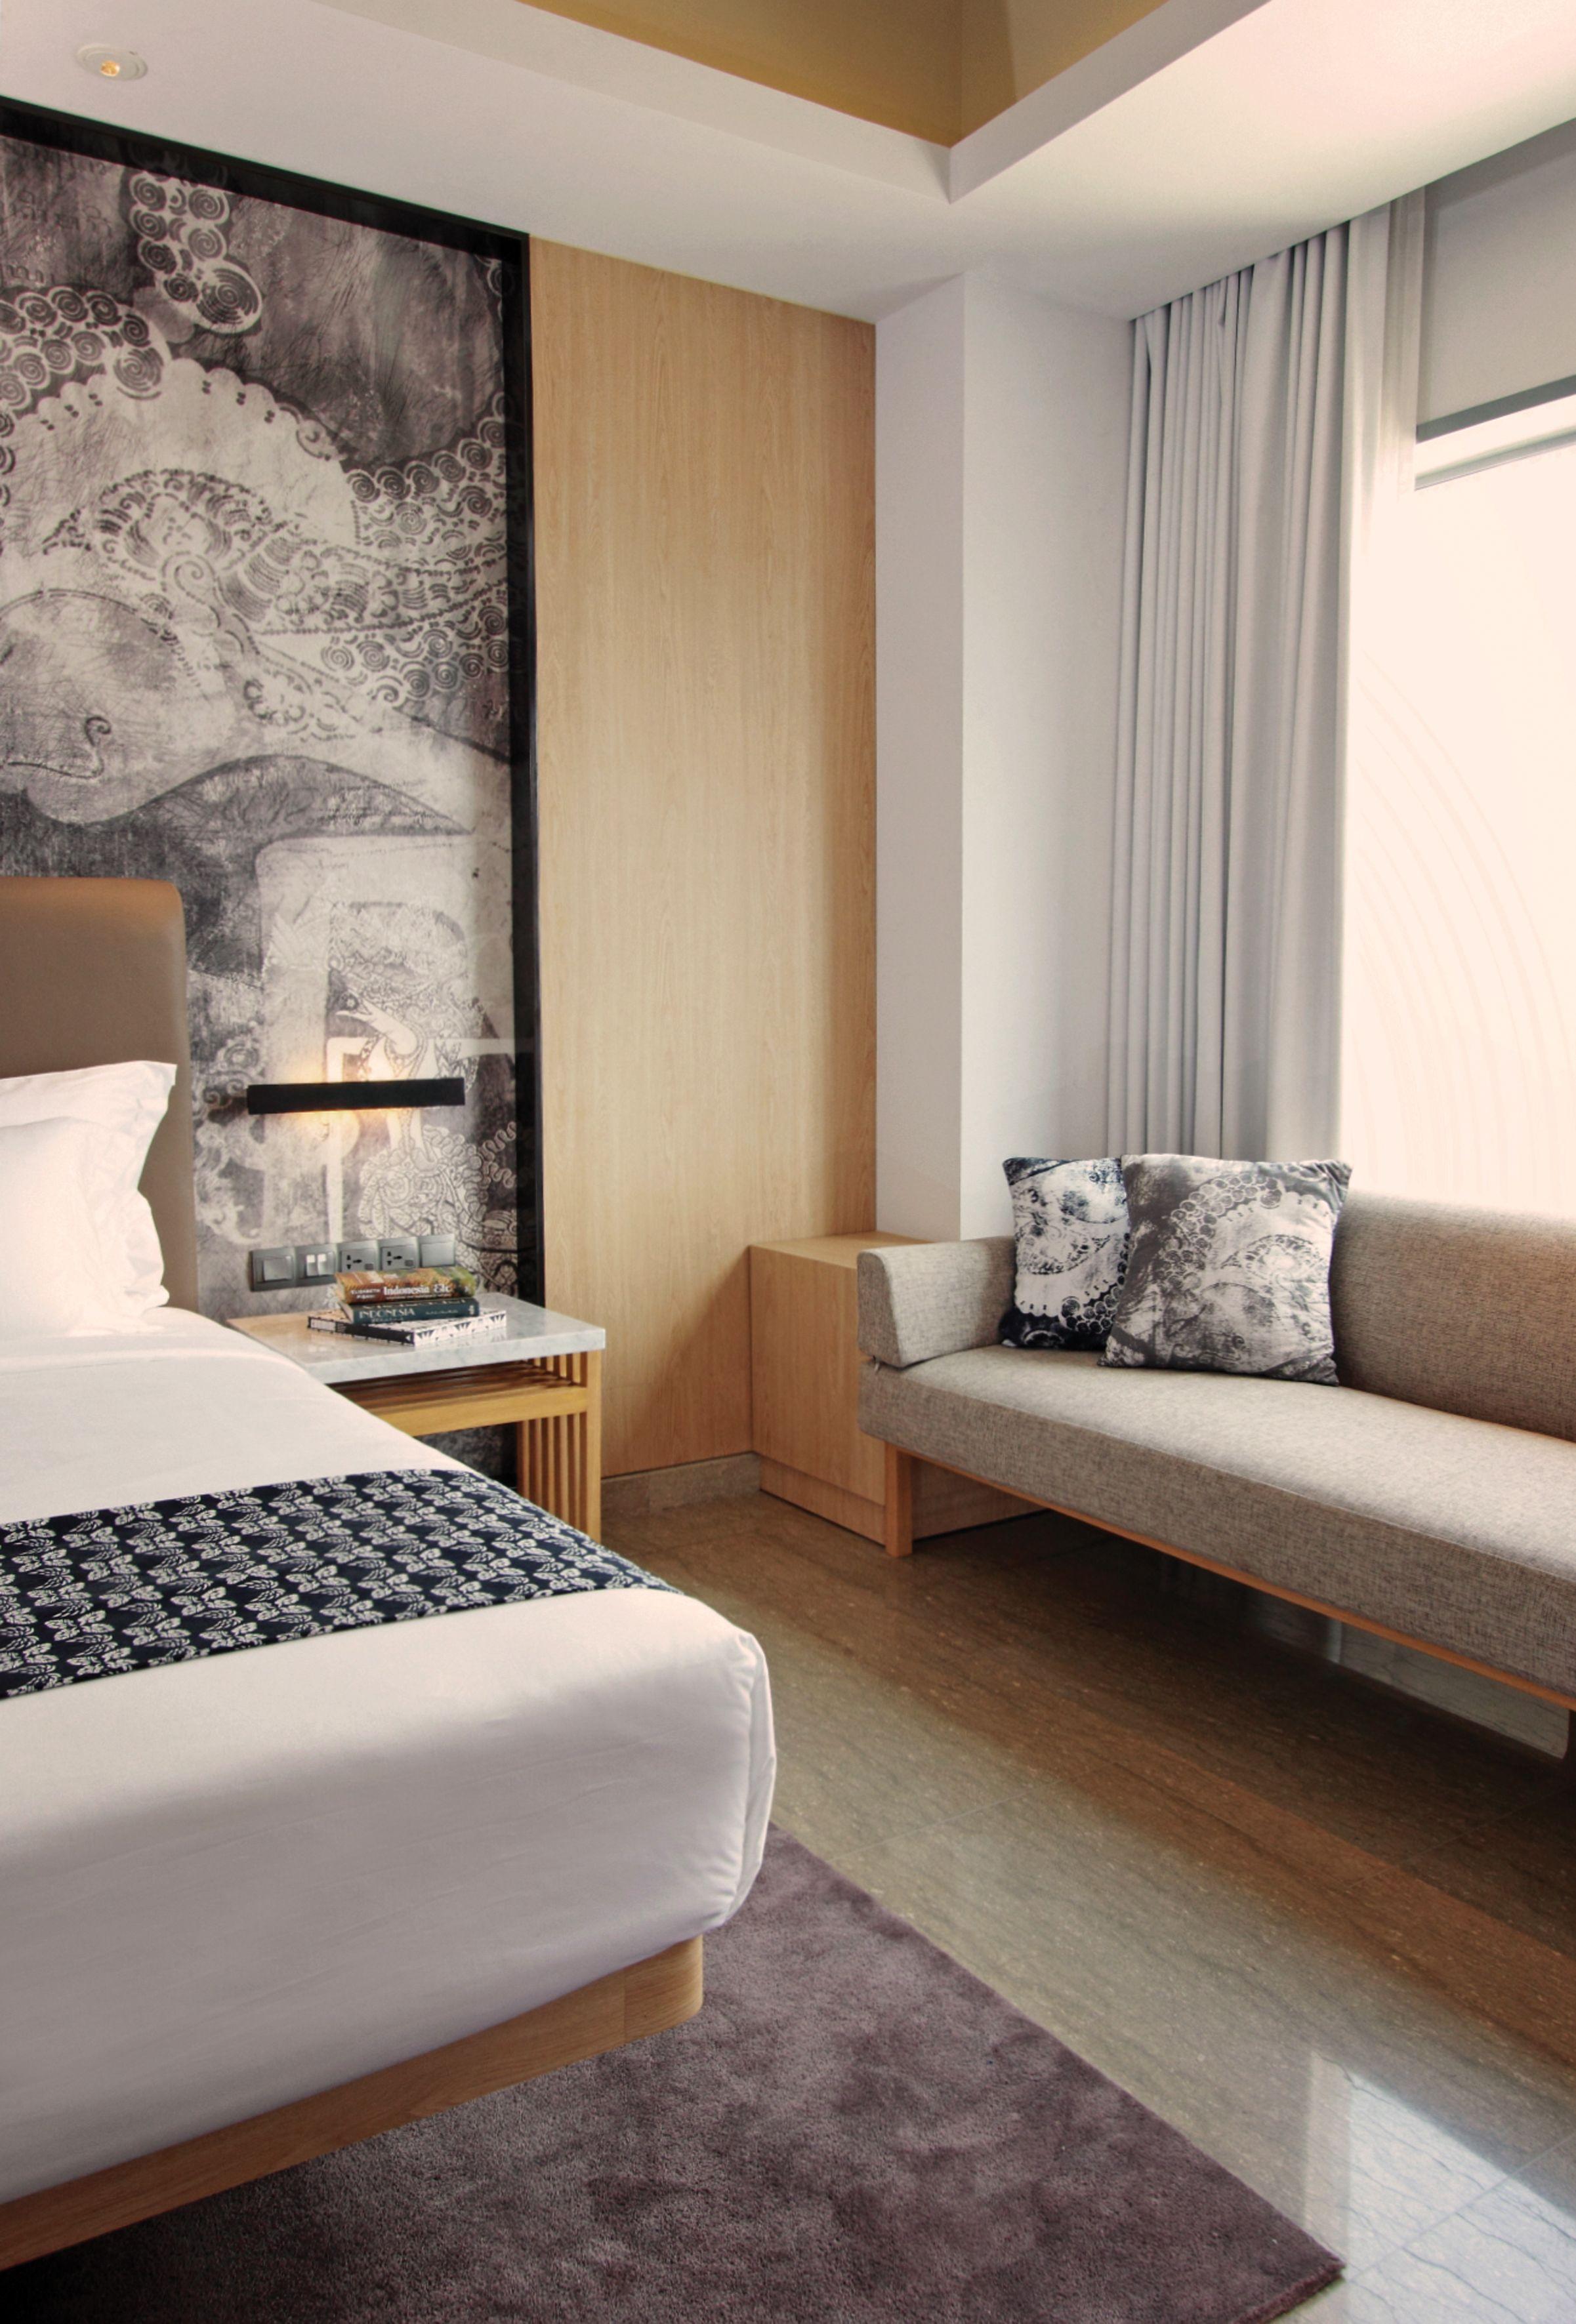 Exotic Hotel Rooms: Alila Solo Https://www.pinterest.com/AnkAdesign/meet-me-at